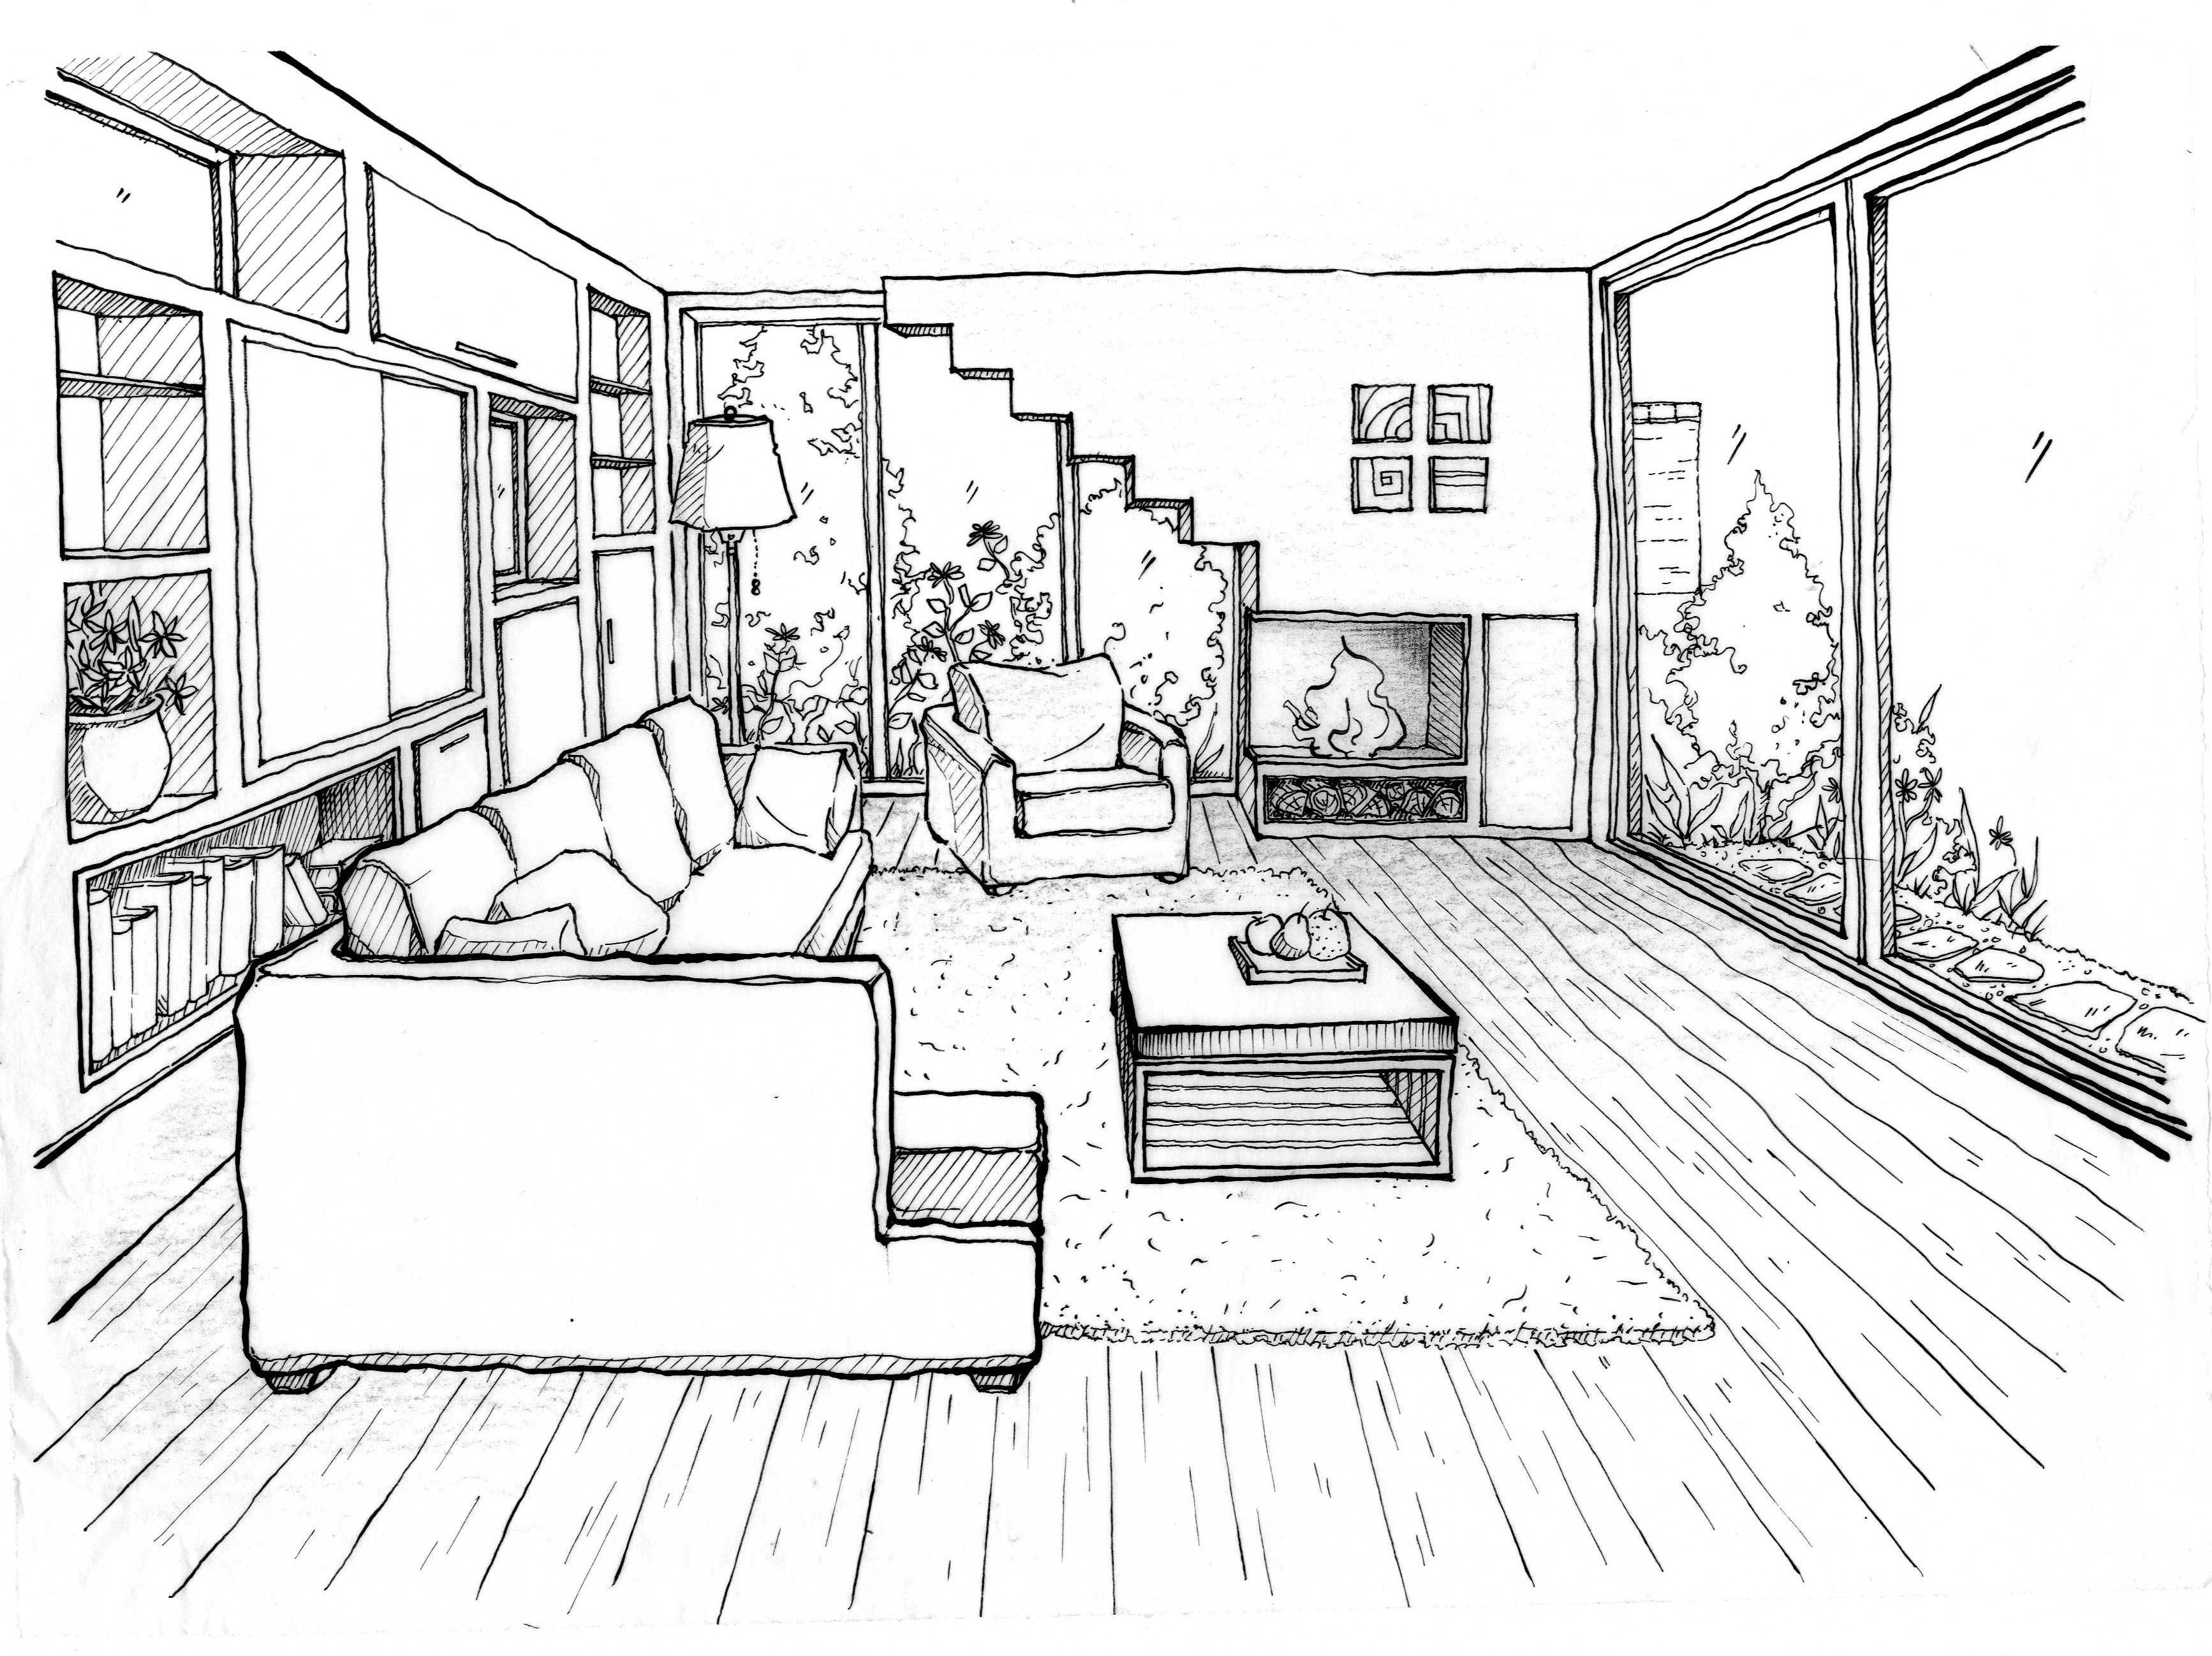 Drawn room single Interior Search Search reception perspective